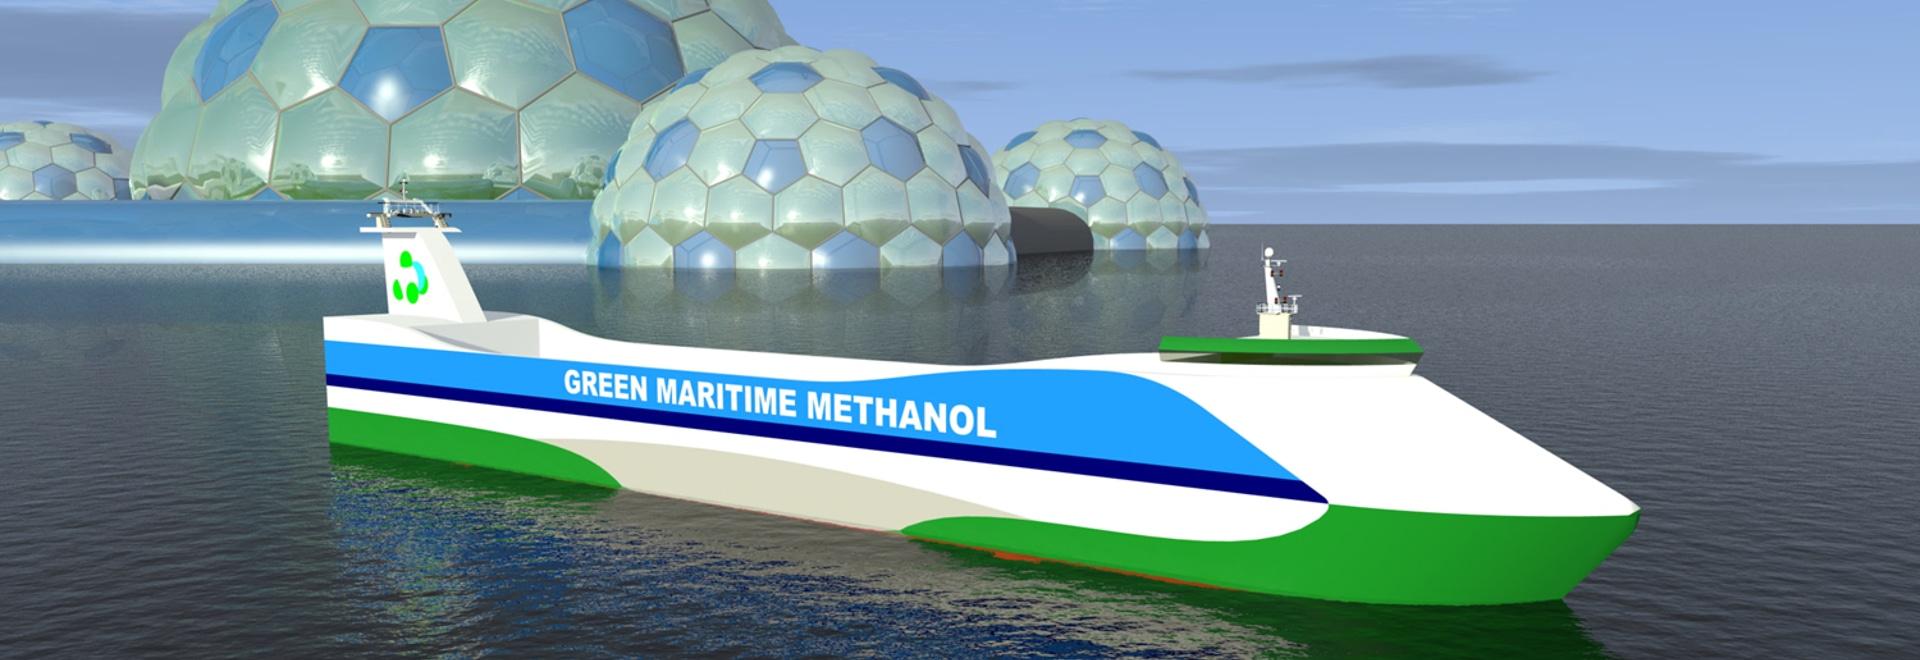 Dutch shipyards investigate sustainable fuel alternative